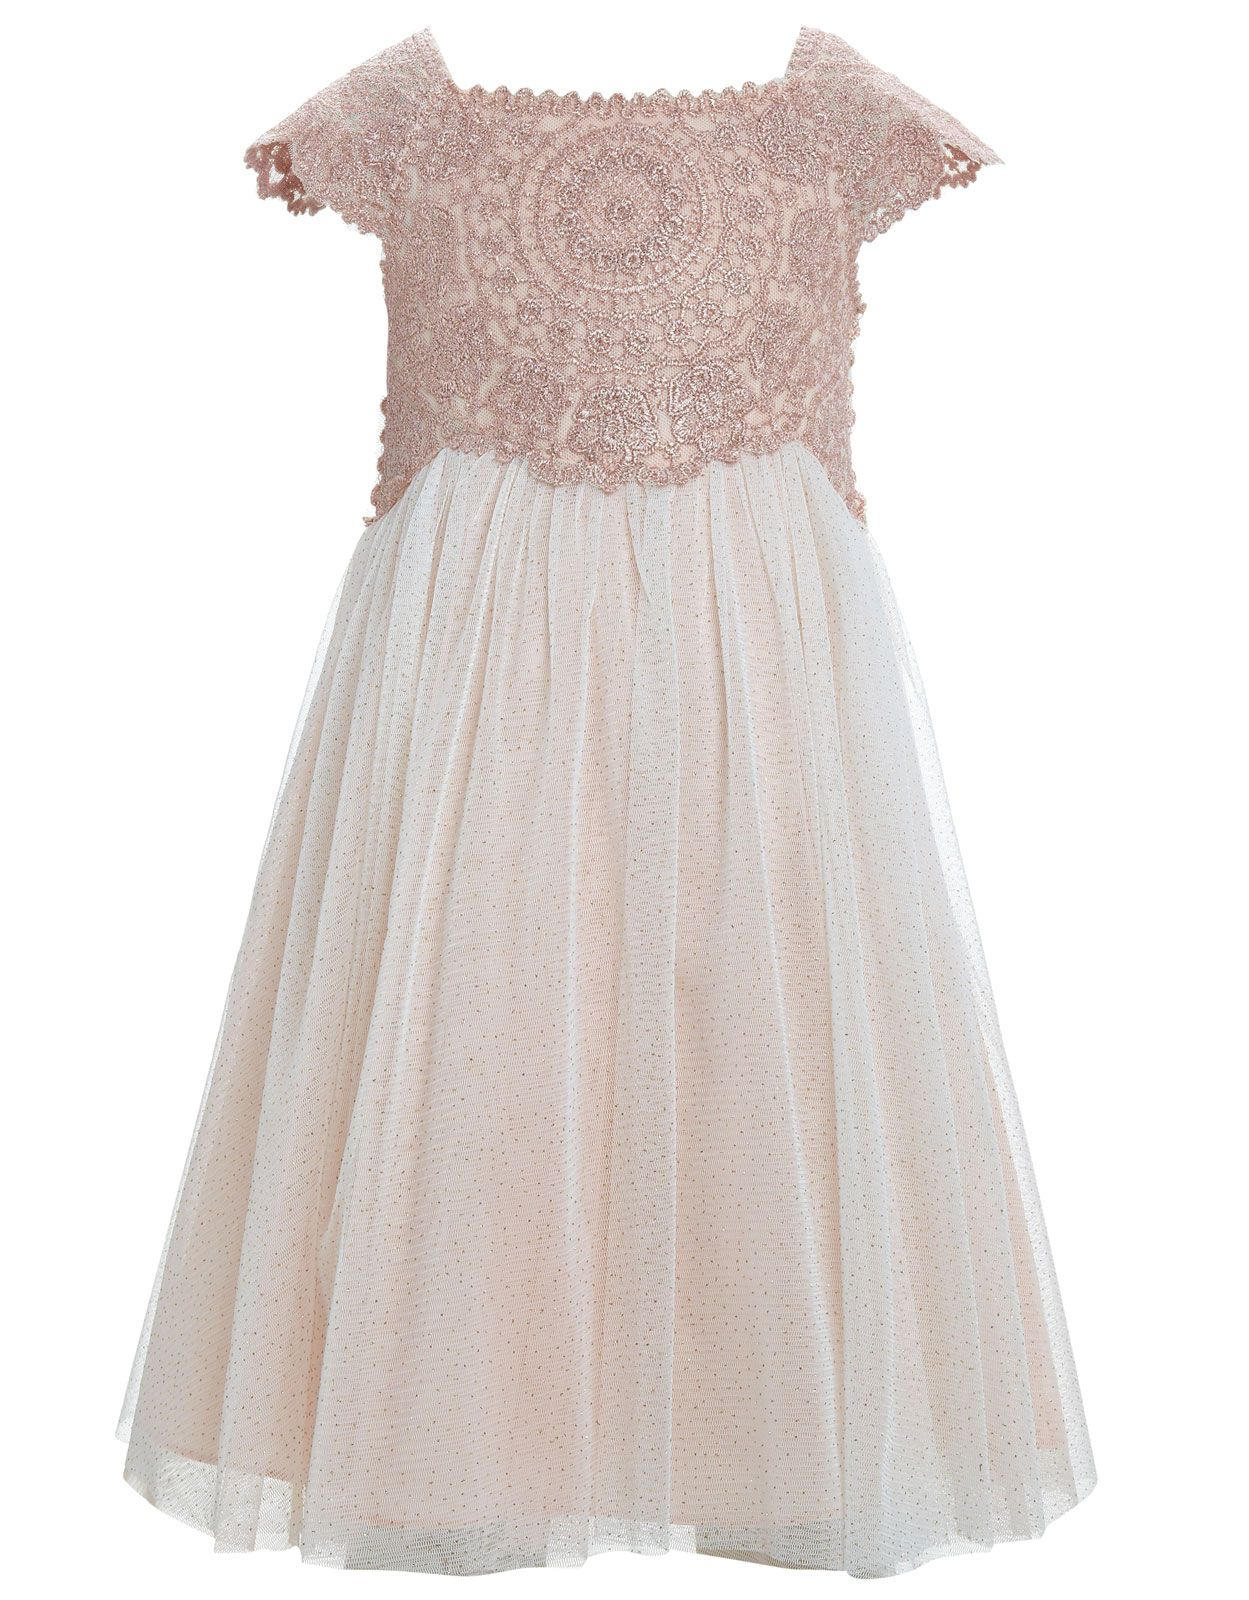 Baby Estella Pink Sparkle Dress Pink Monsoon 7000 To Love